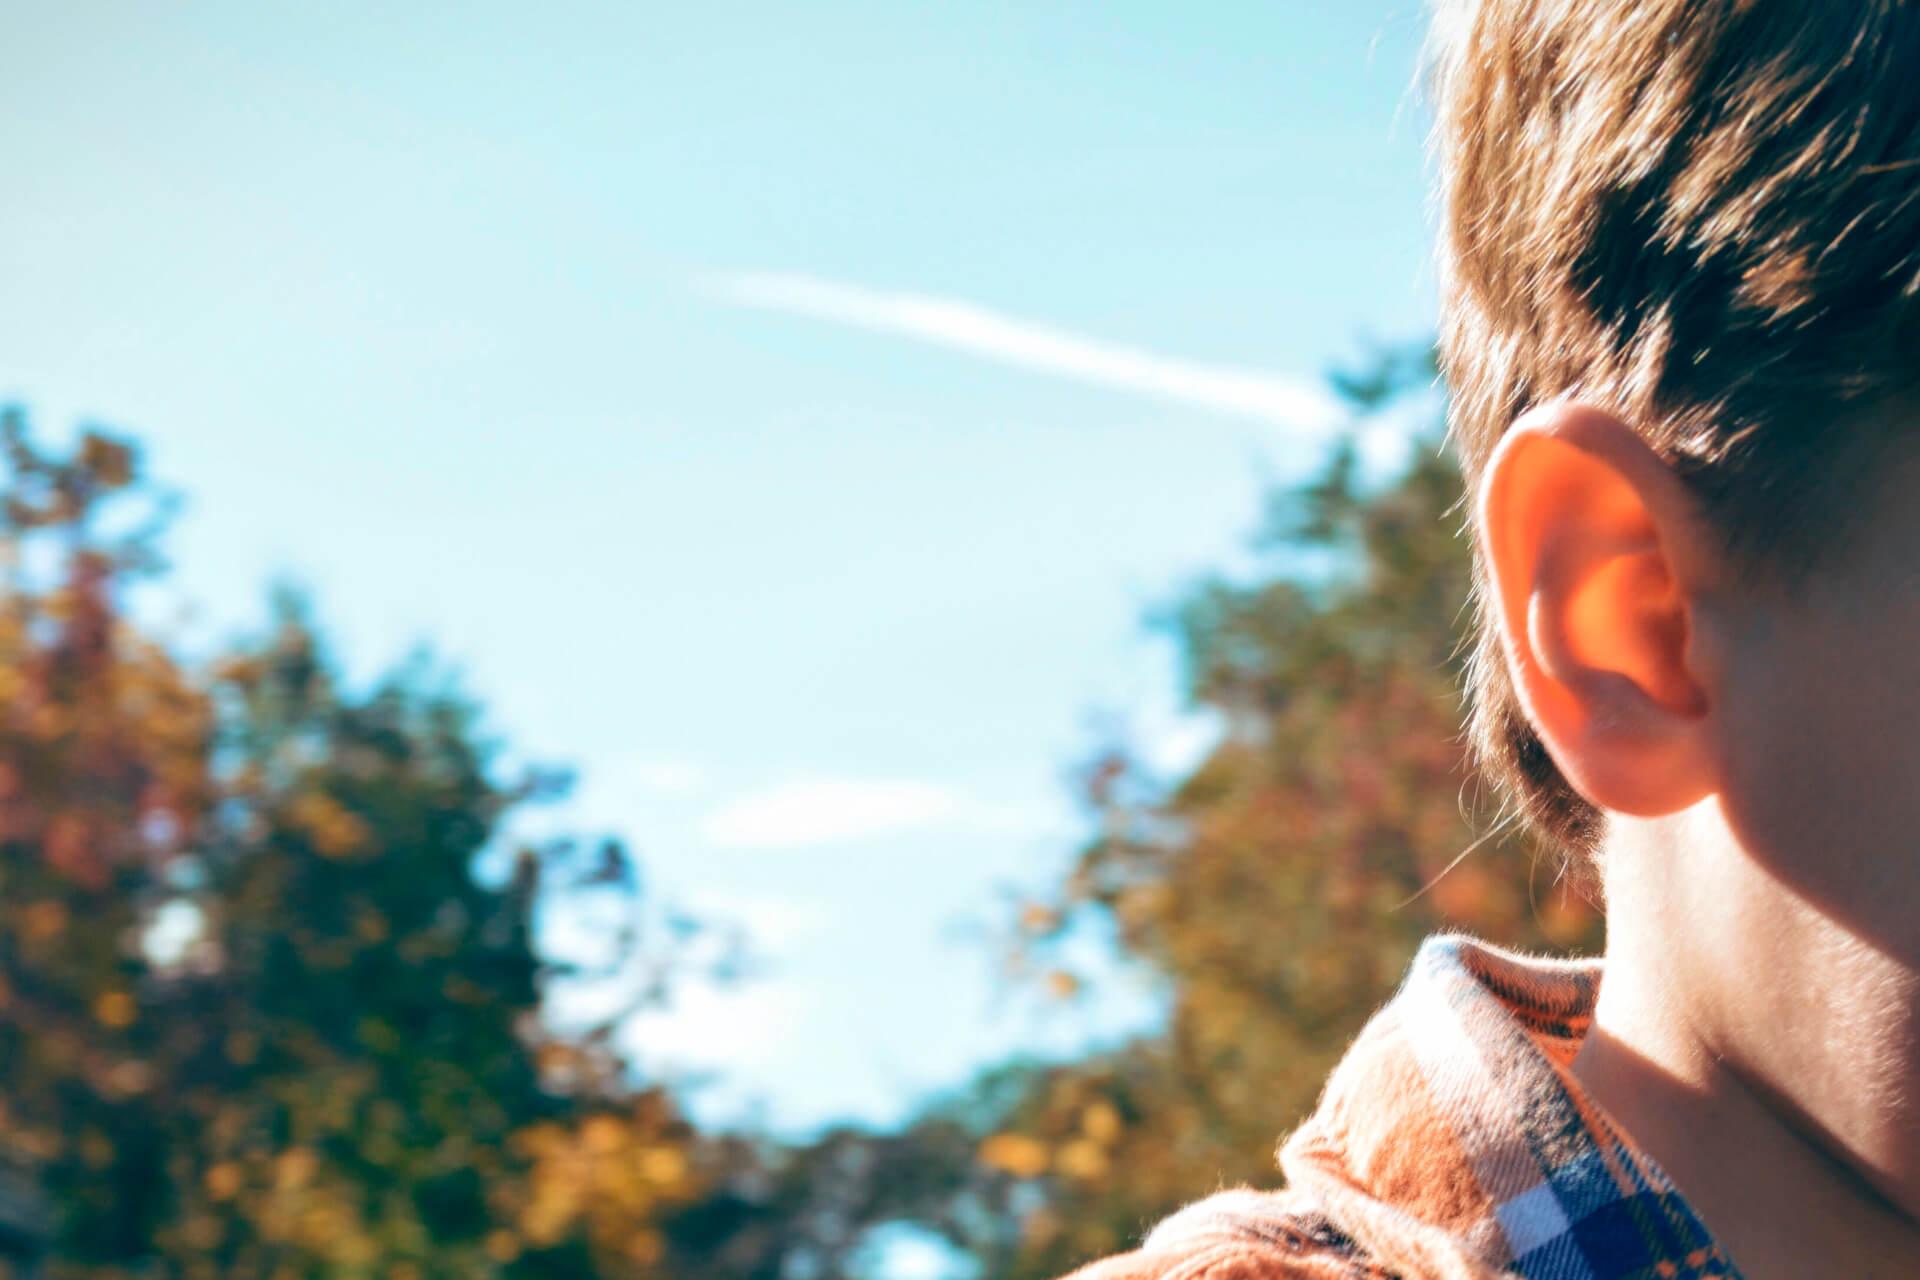 Implante osteointegrado auditivo